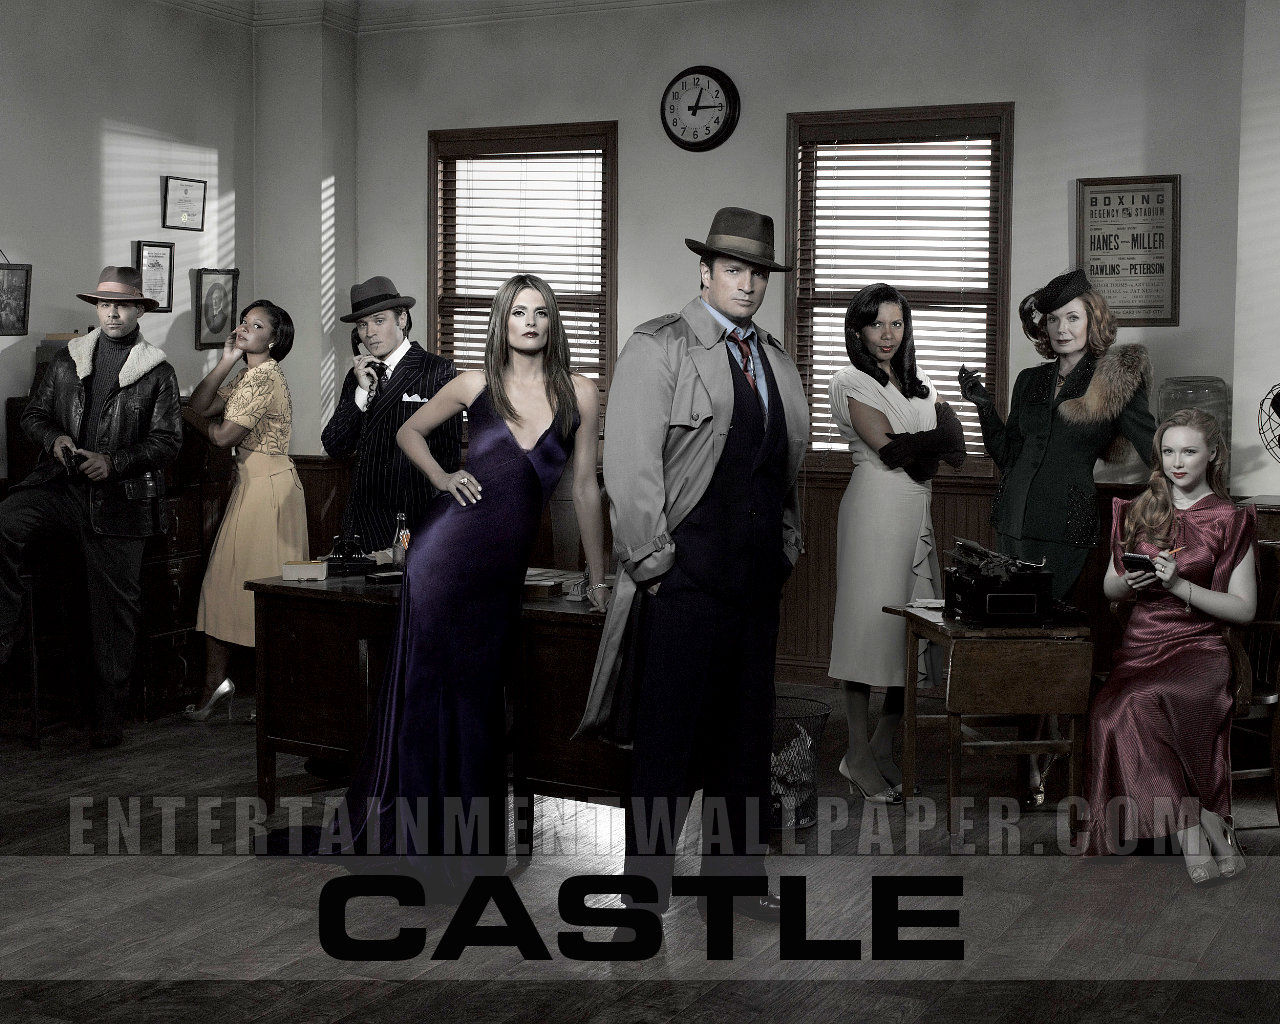 castle tv wallpaper for desktop - wallpapersafari